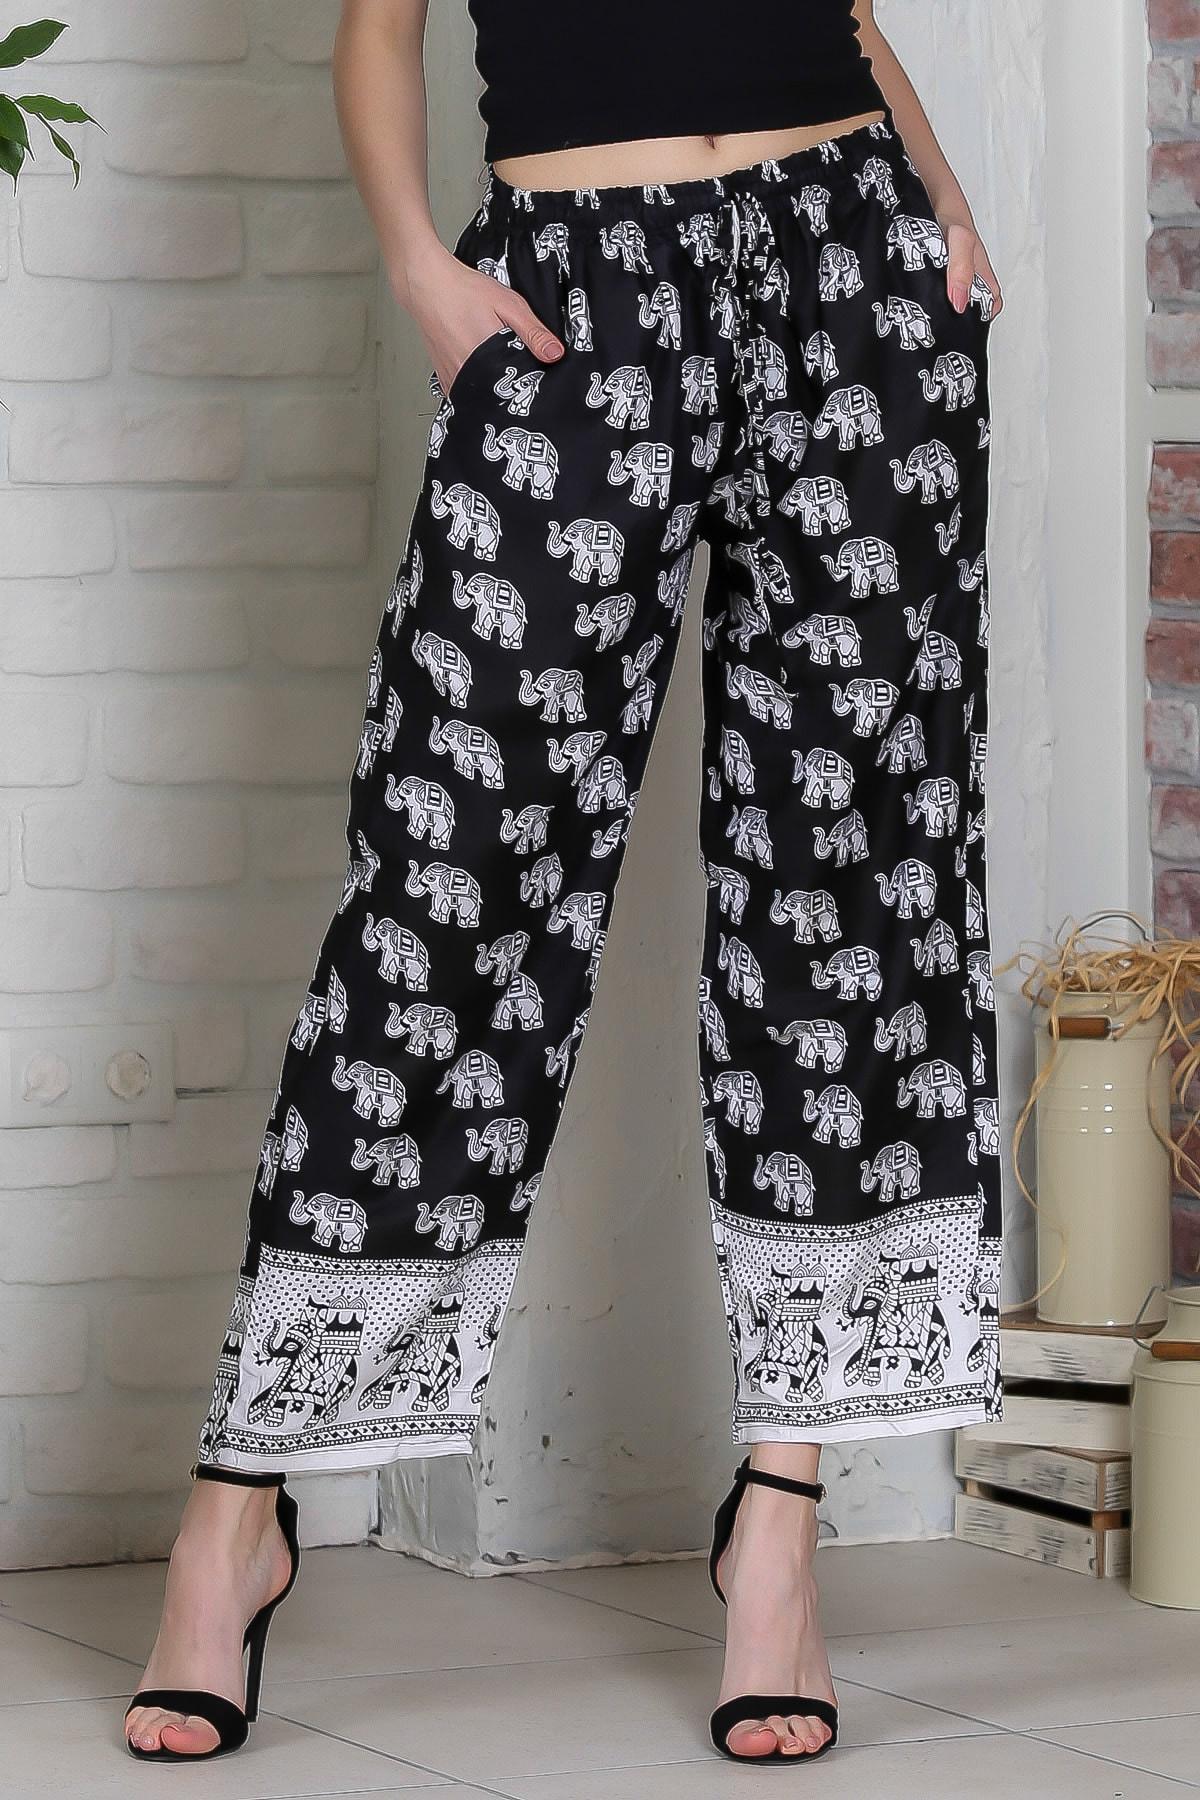 Chiccy Kadın Siyah Fil Desenli Cep Detaylı Dokuma Pantolon M10060000PN98900